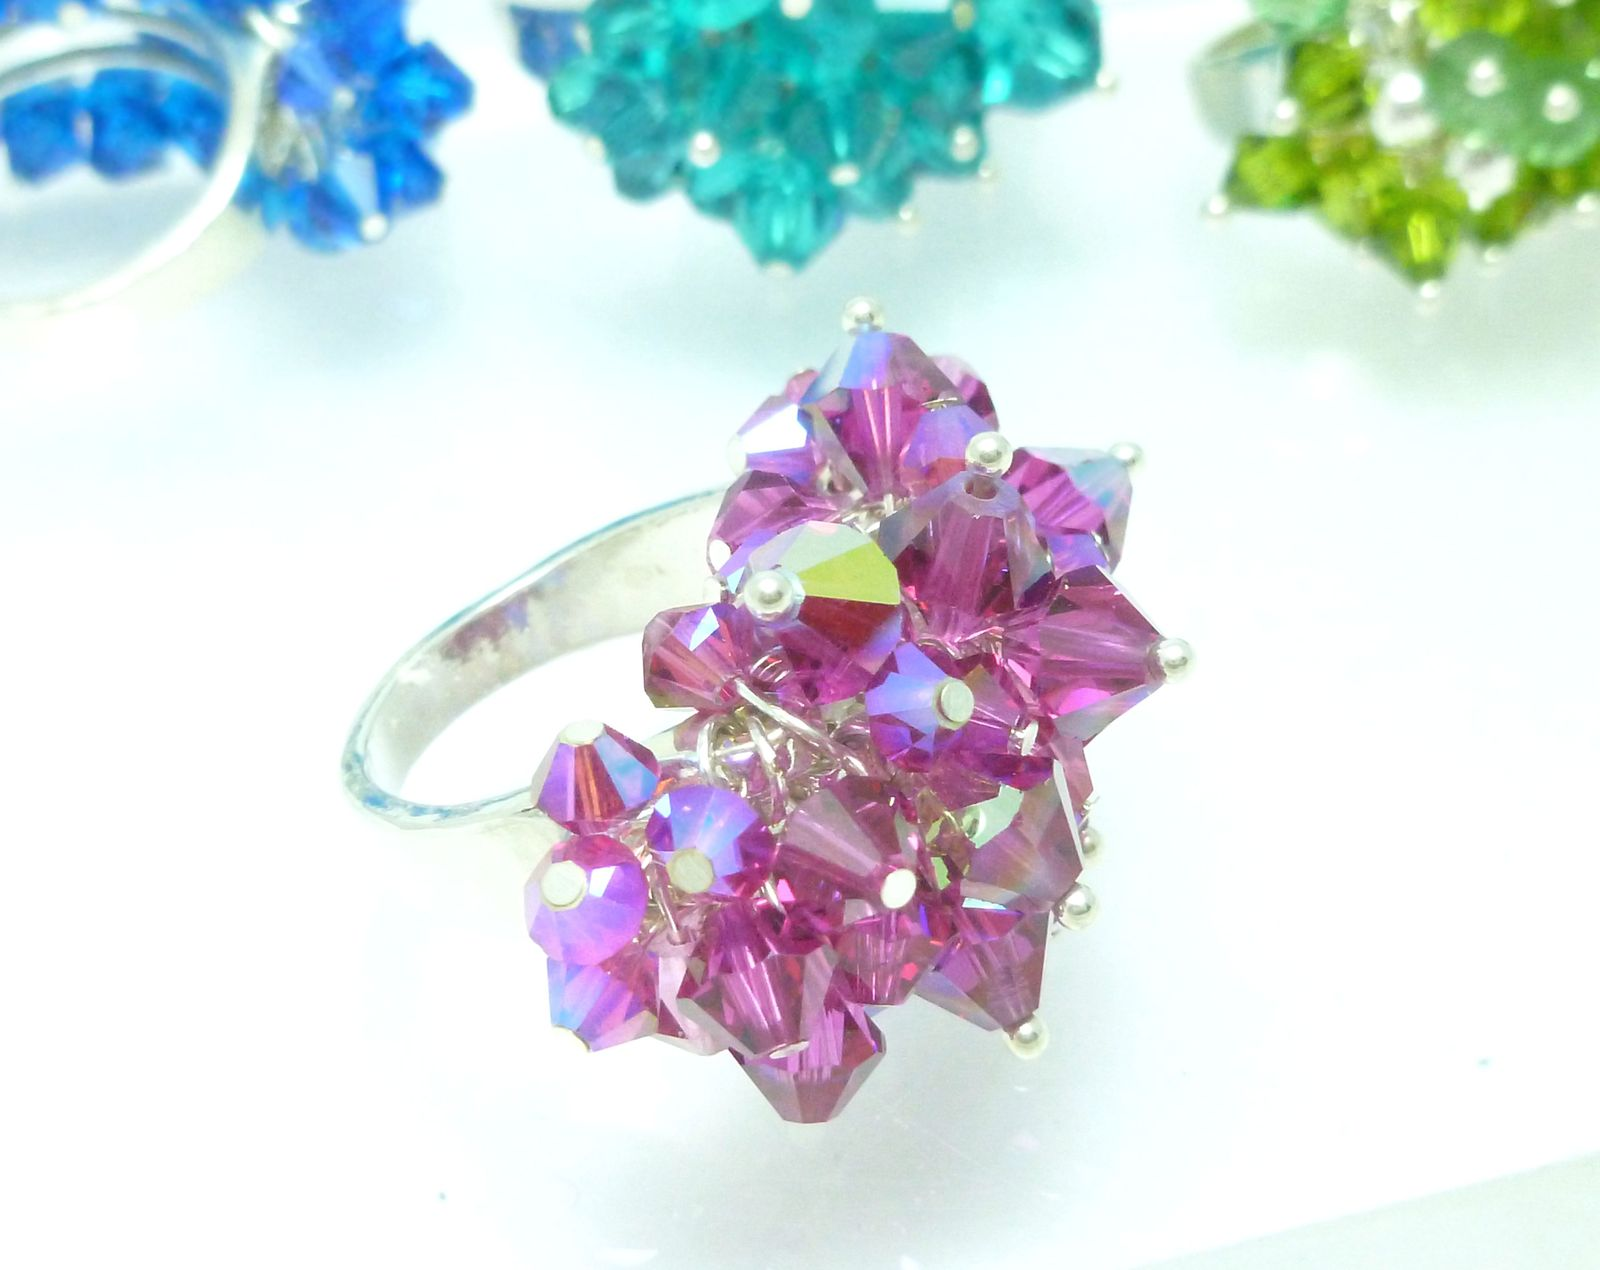 Swarovski Crystal Beaded Ring, Fuchsia, Sterling, Bling Size 7.25, Cha Cha